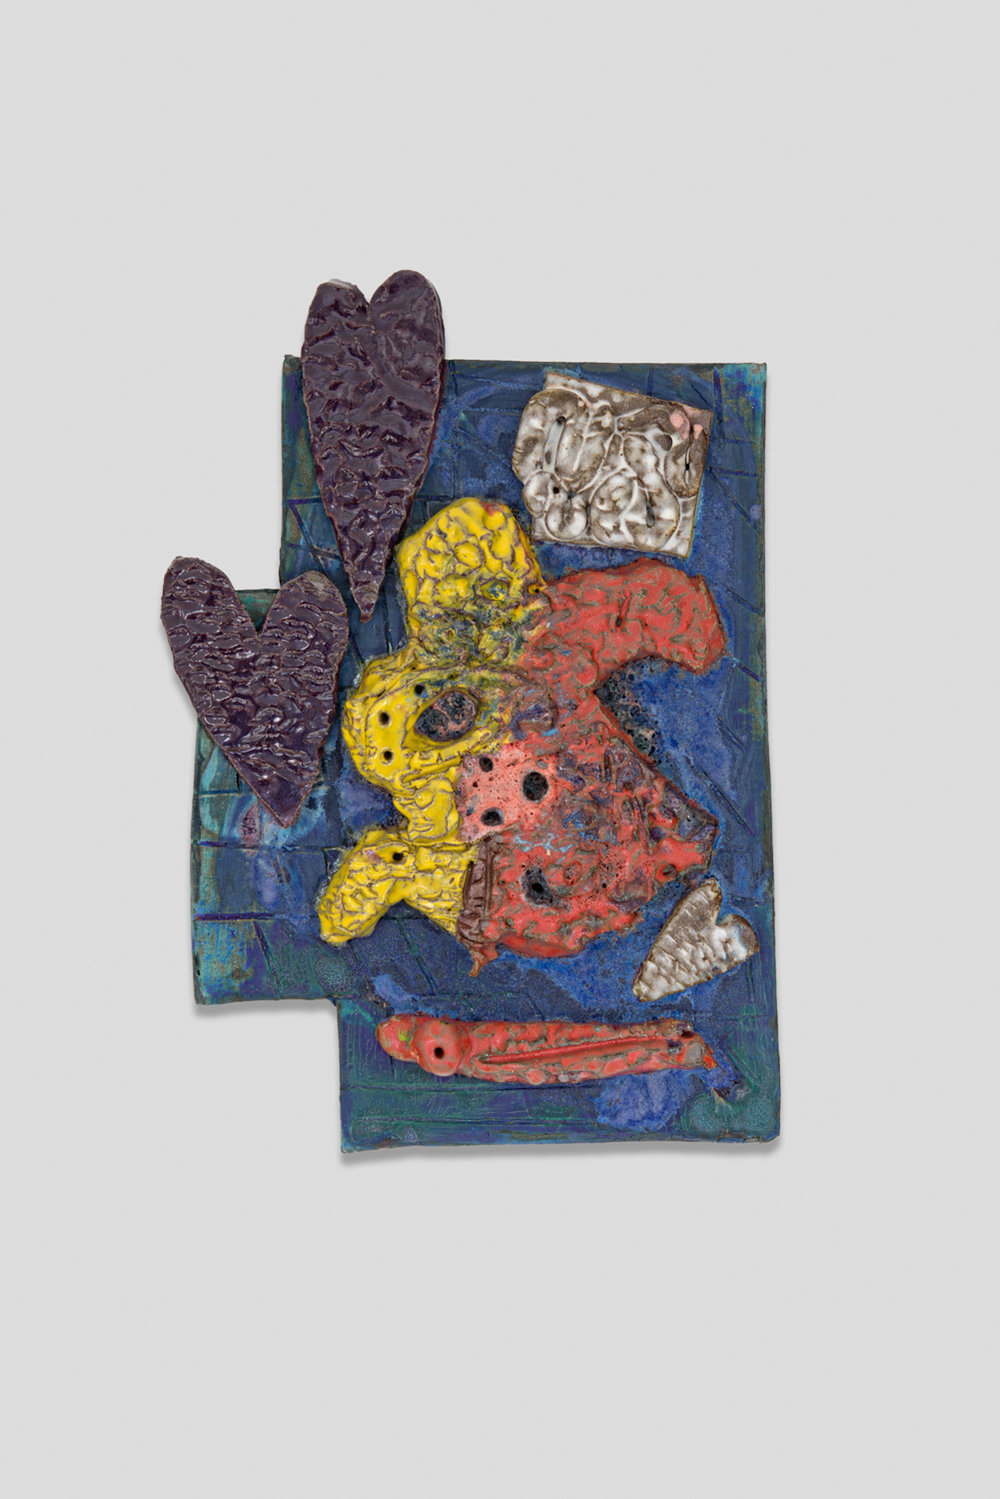 William J.O'Brien  Untitled  2017 Glazed ceramic 19h x 13w x 3d in WOB1234